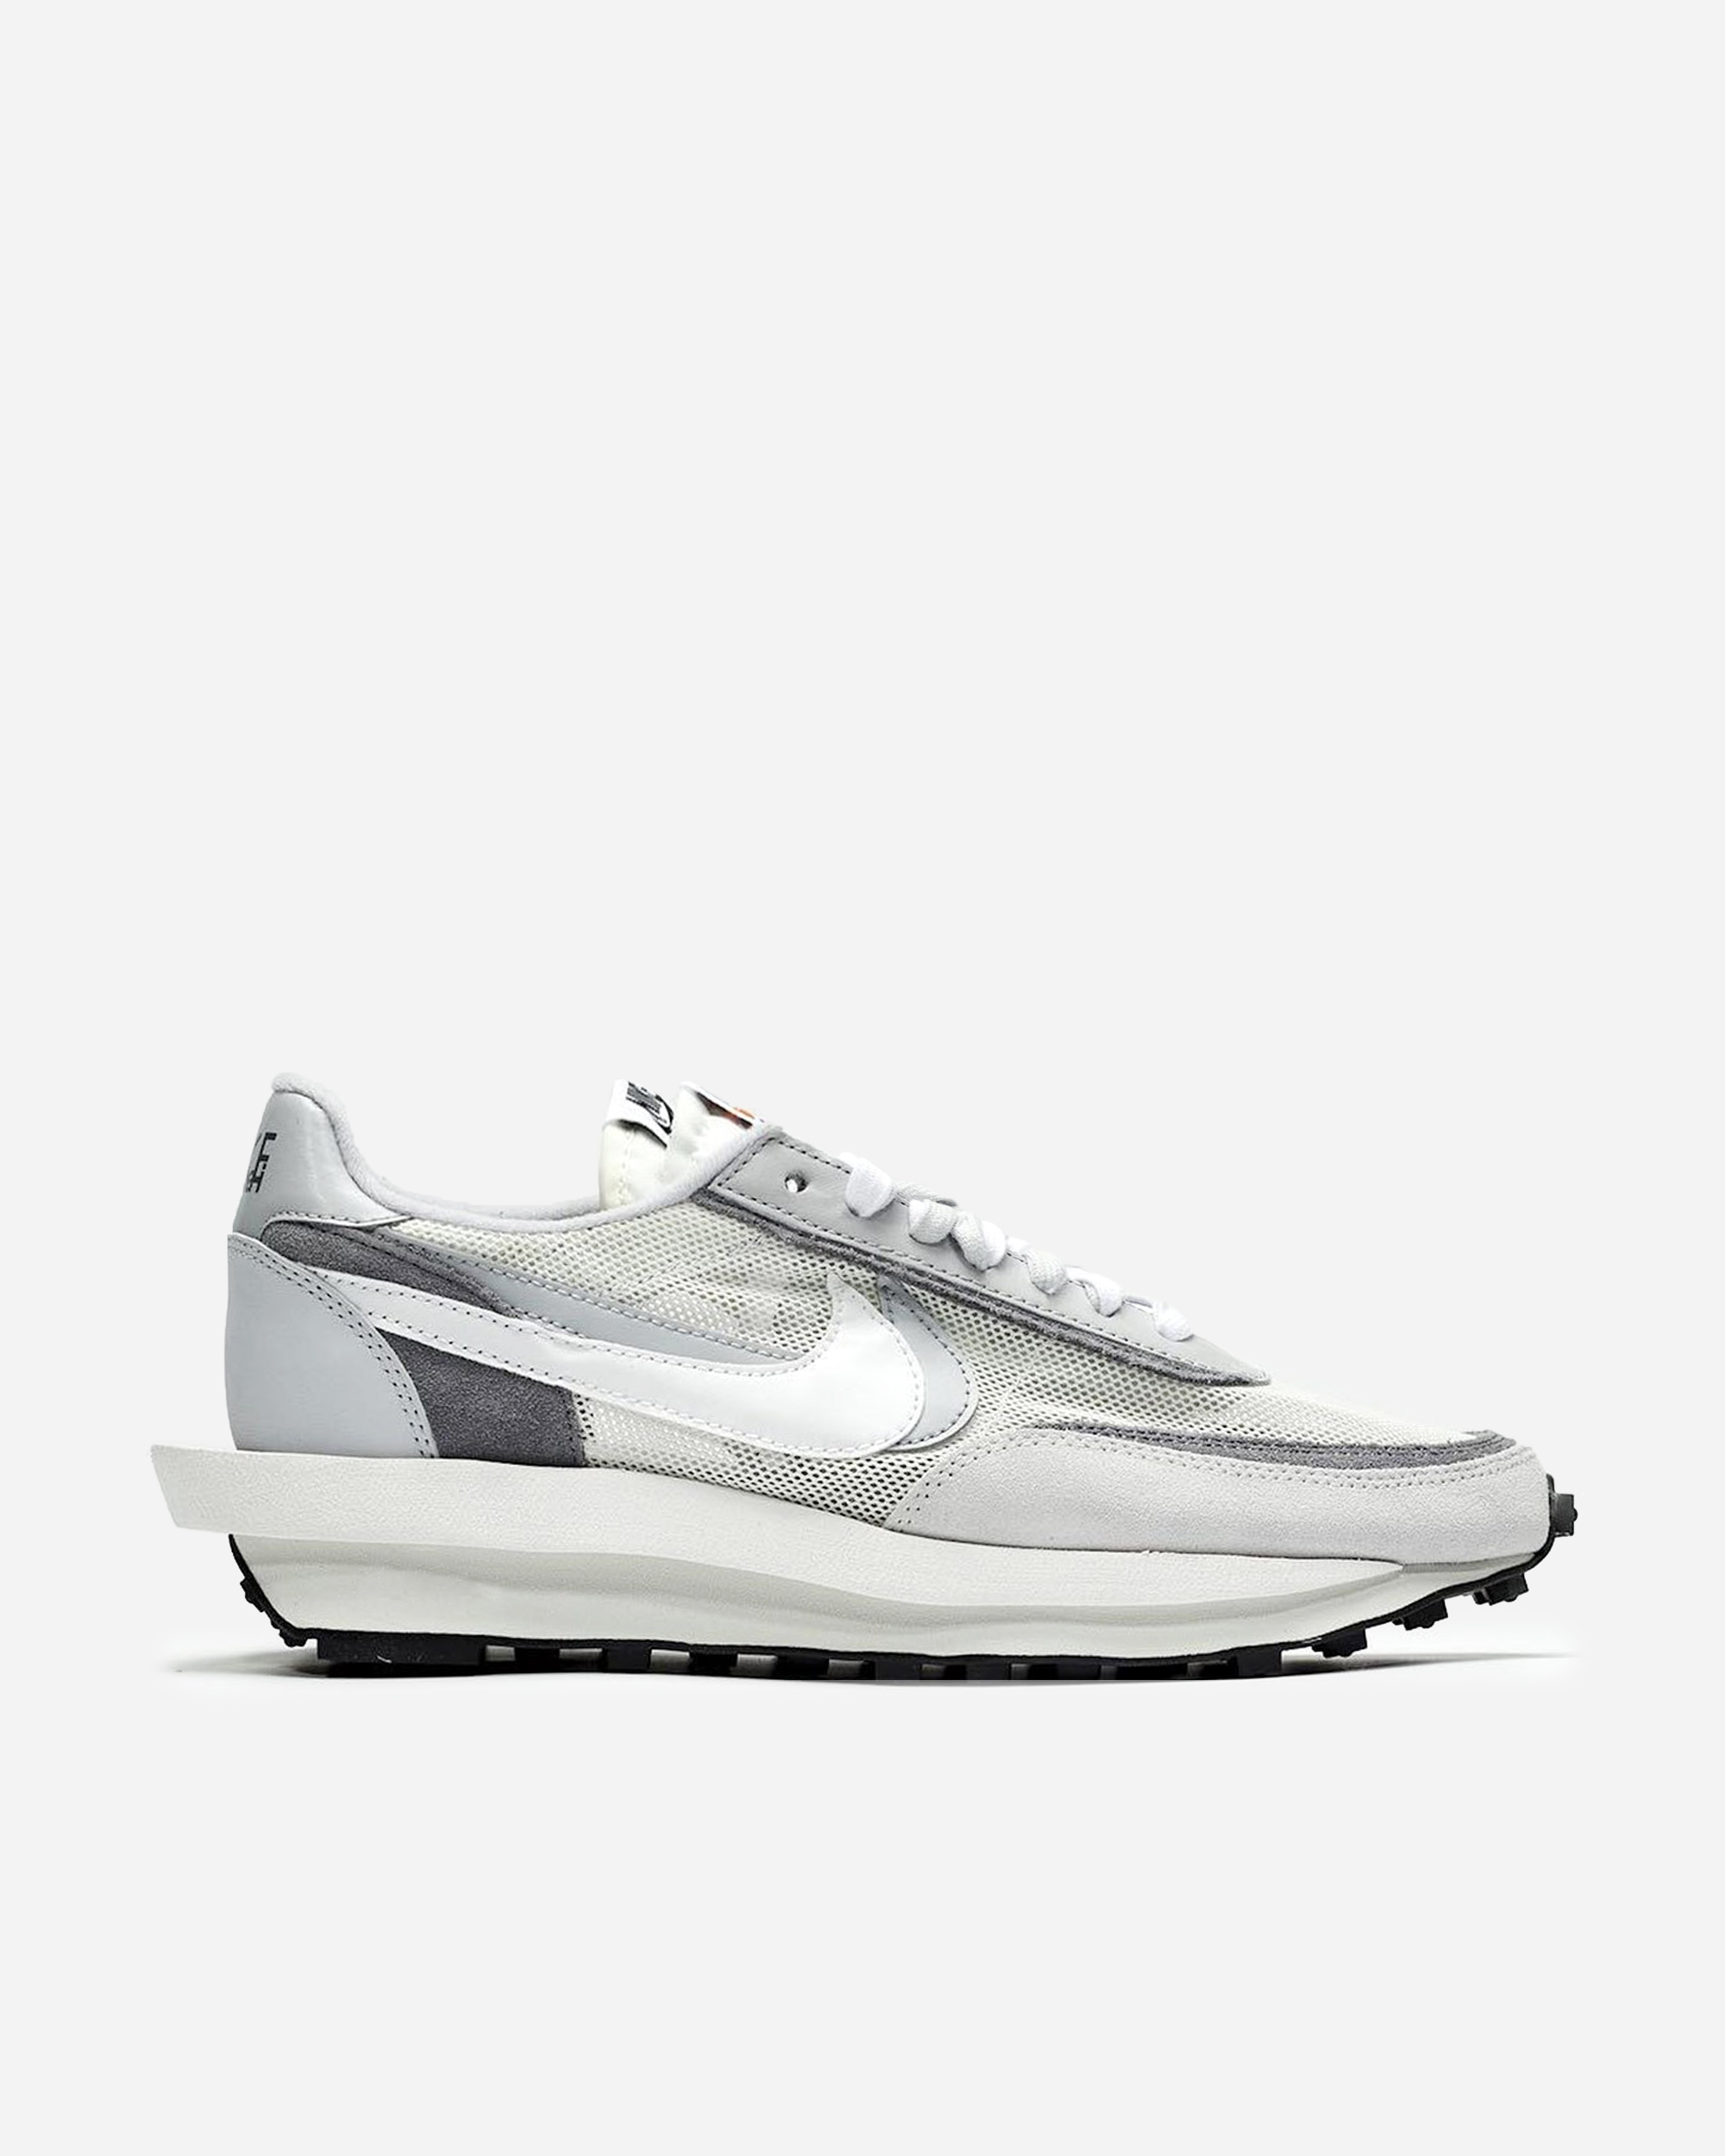 Nike Sportswear Nike x Sacai LDWaffle